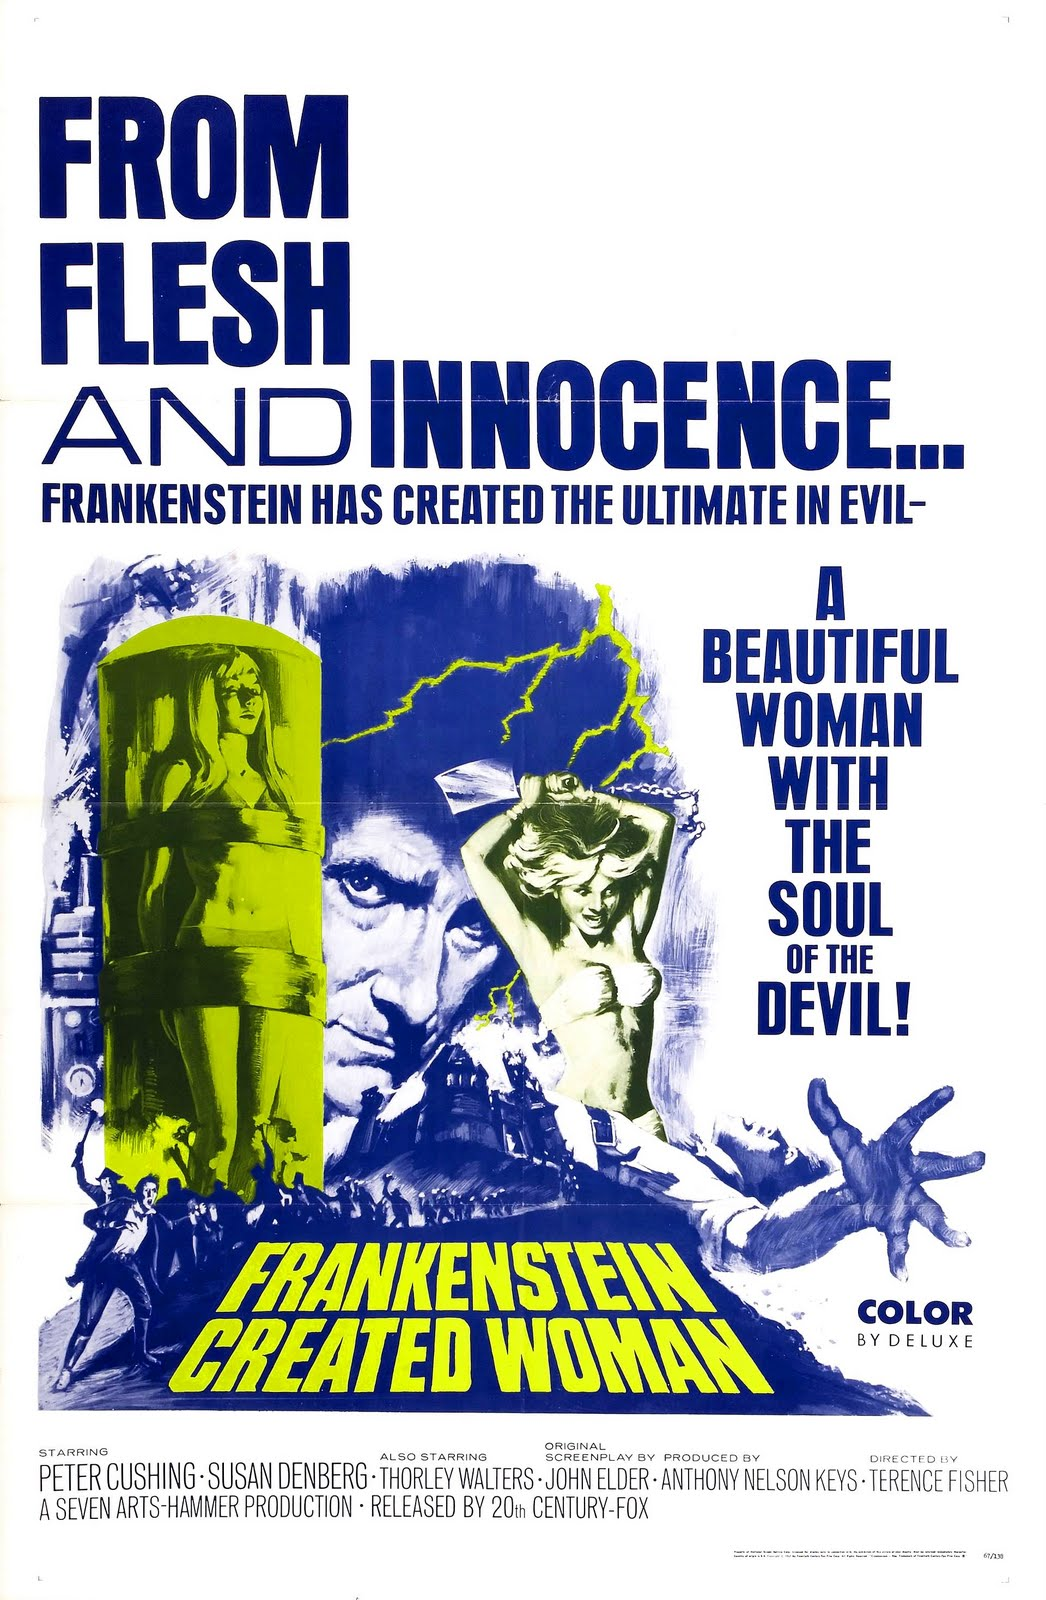 Frankenstein Created Woman Poster But We're British!: Fr...